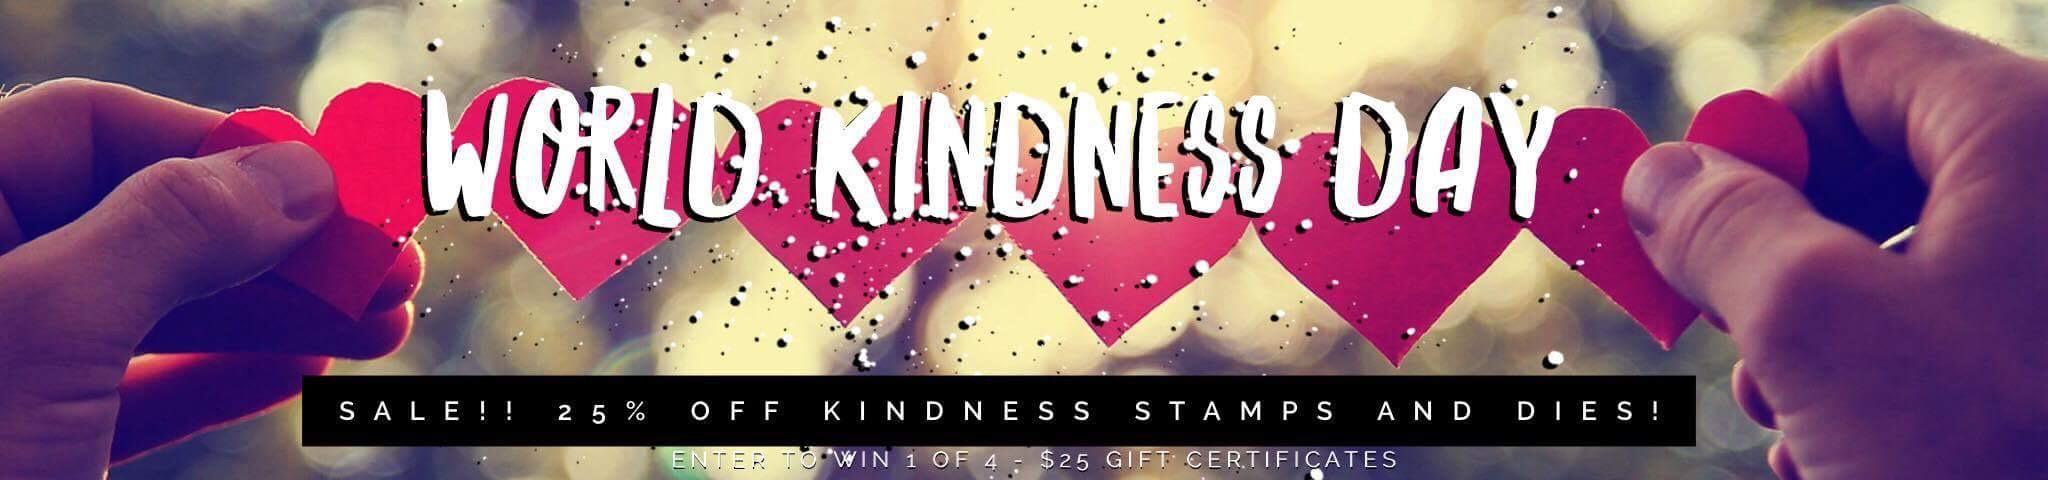 Celebrating World Kindness Day!